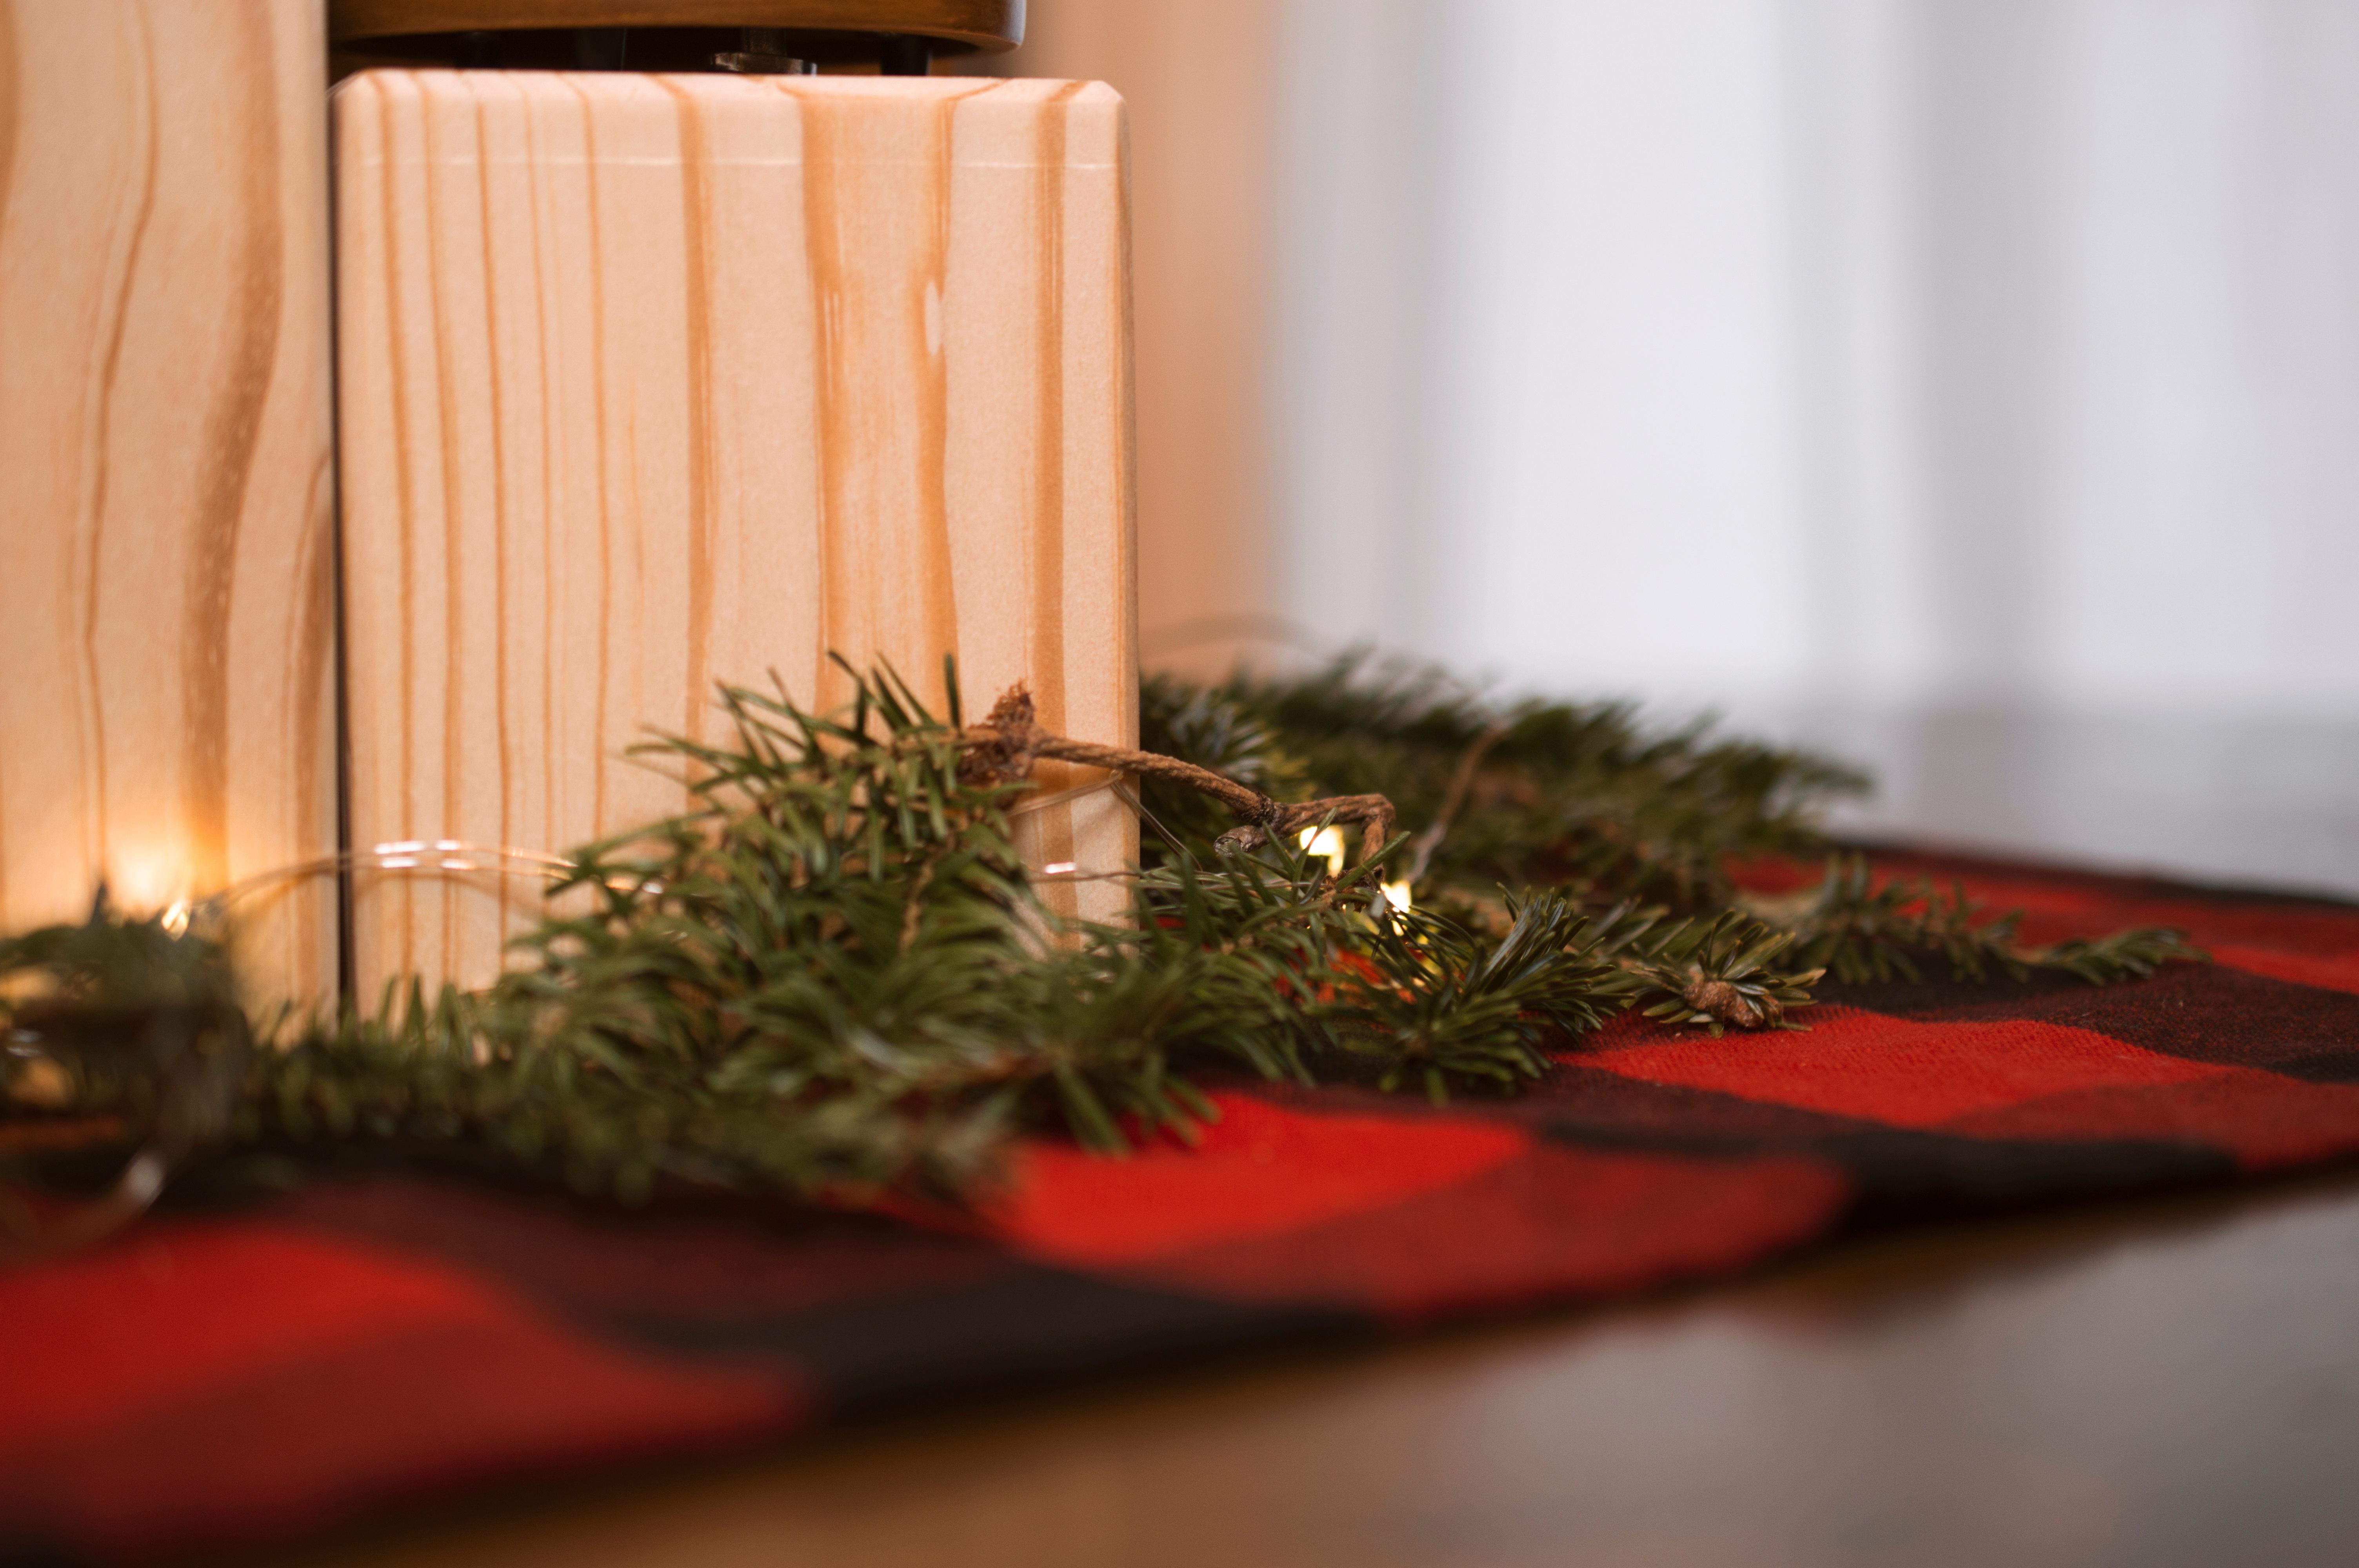 images gratuites fleur repas arbre de no l design d 39 int rieur d coration de no l. Black Bedroom Furniture Sets. Home Design Ideas